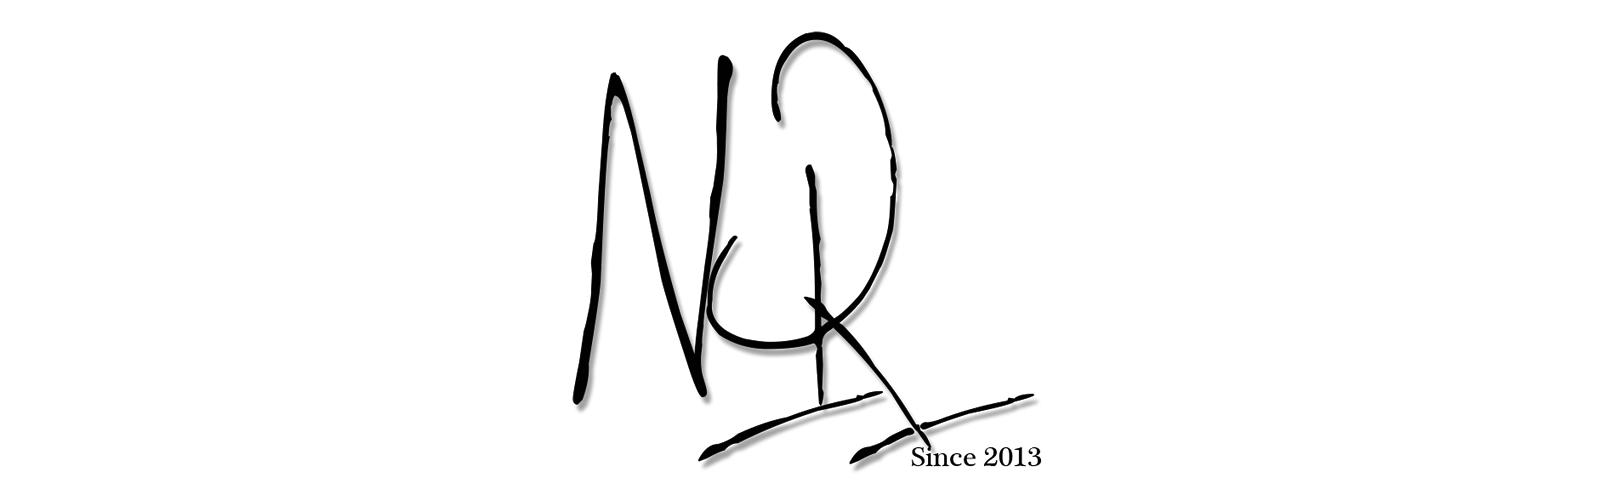 Nara Rugani